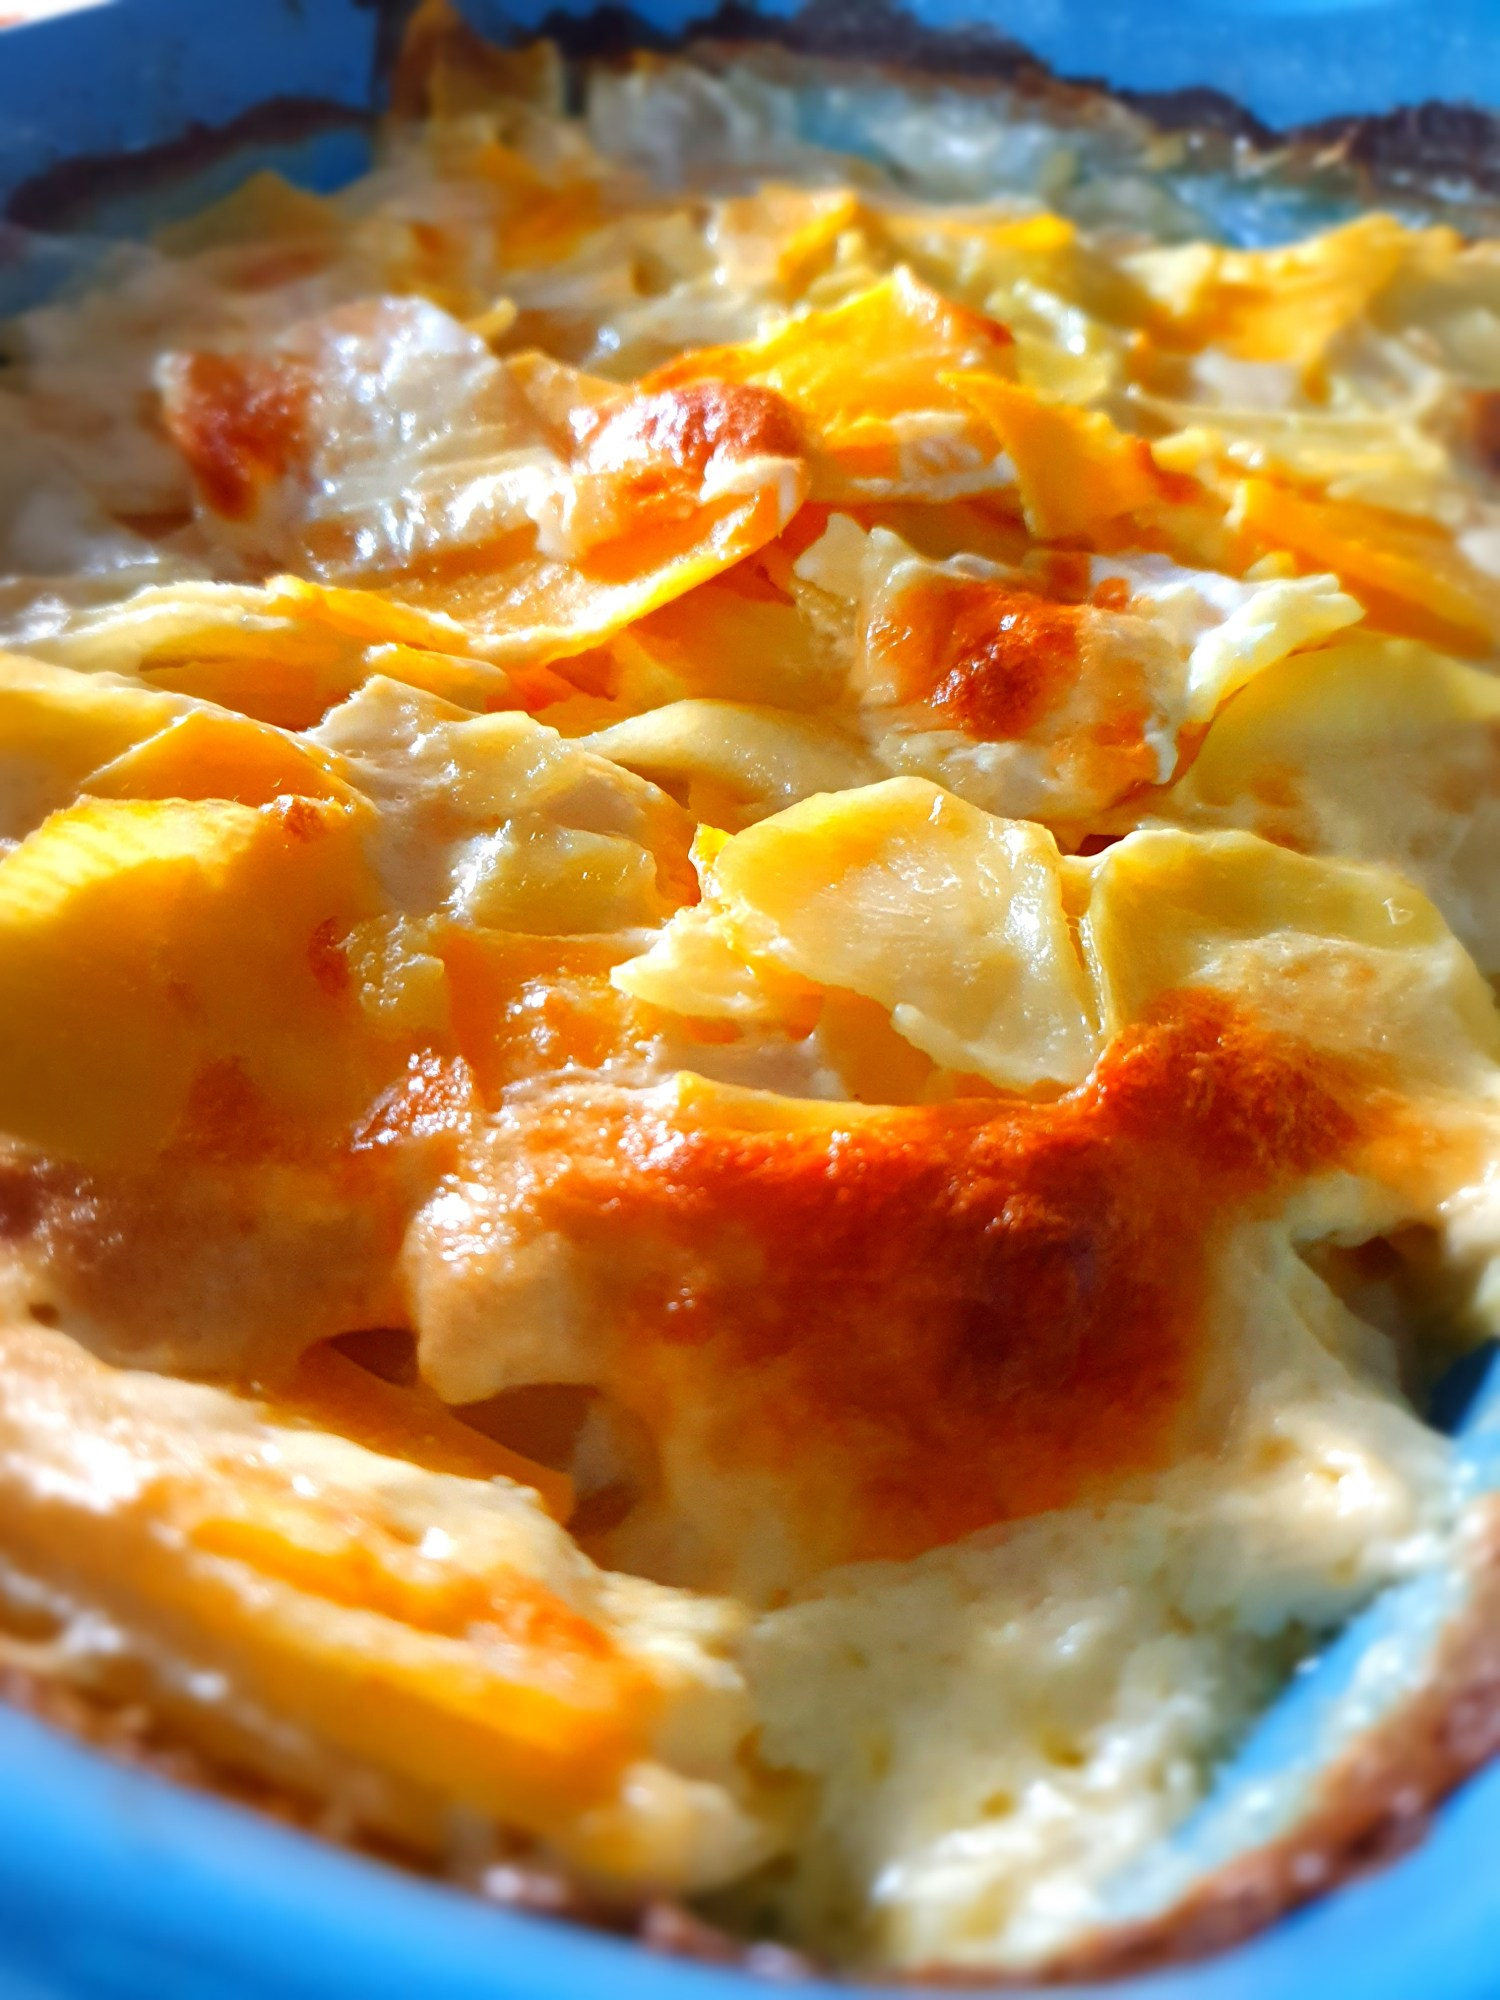 potato and turnip gratin